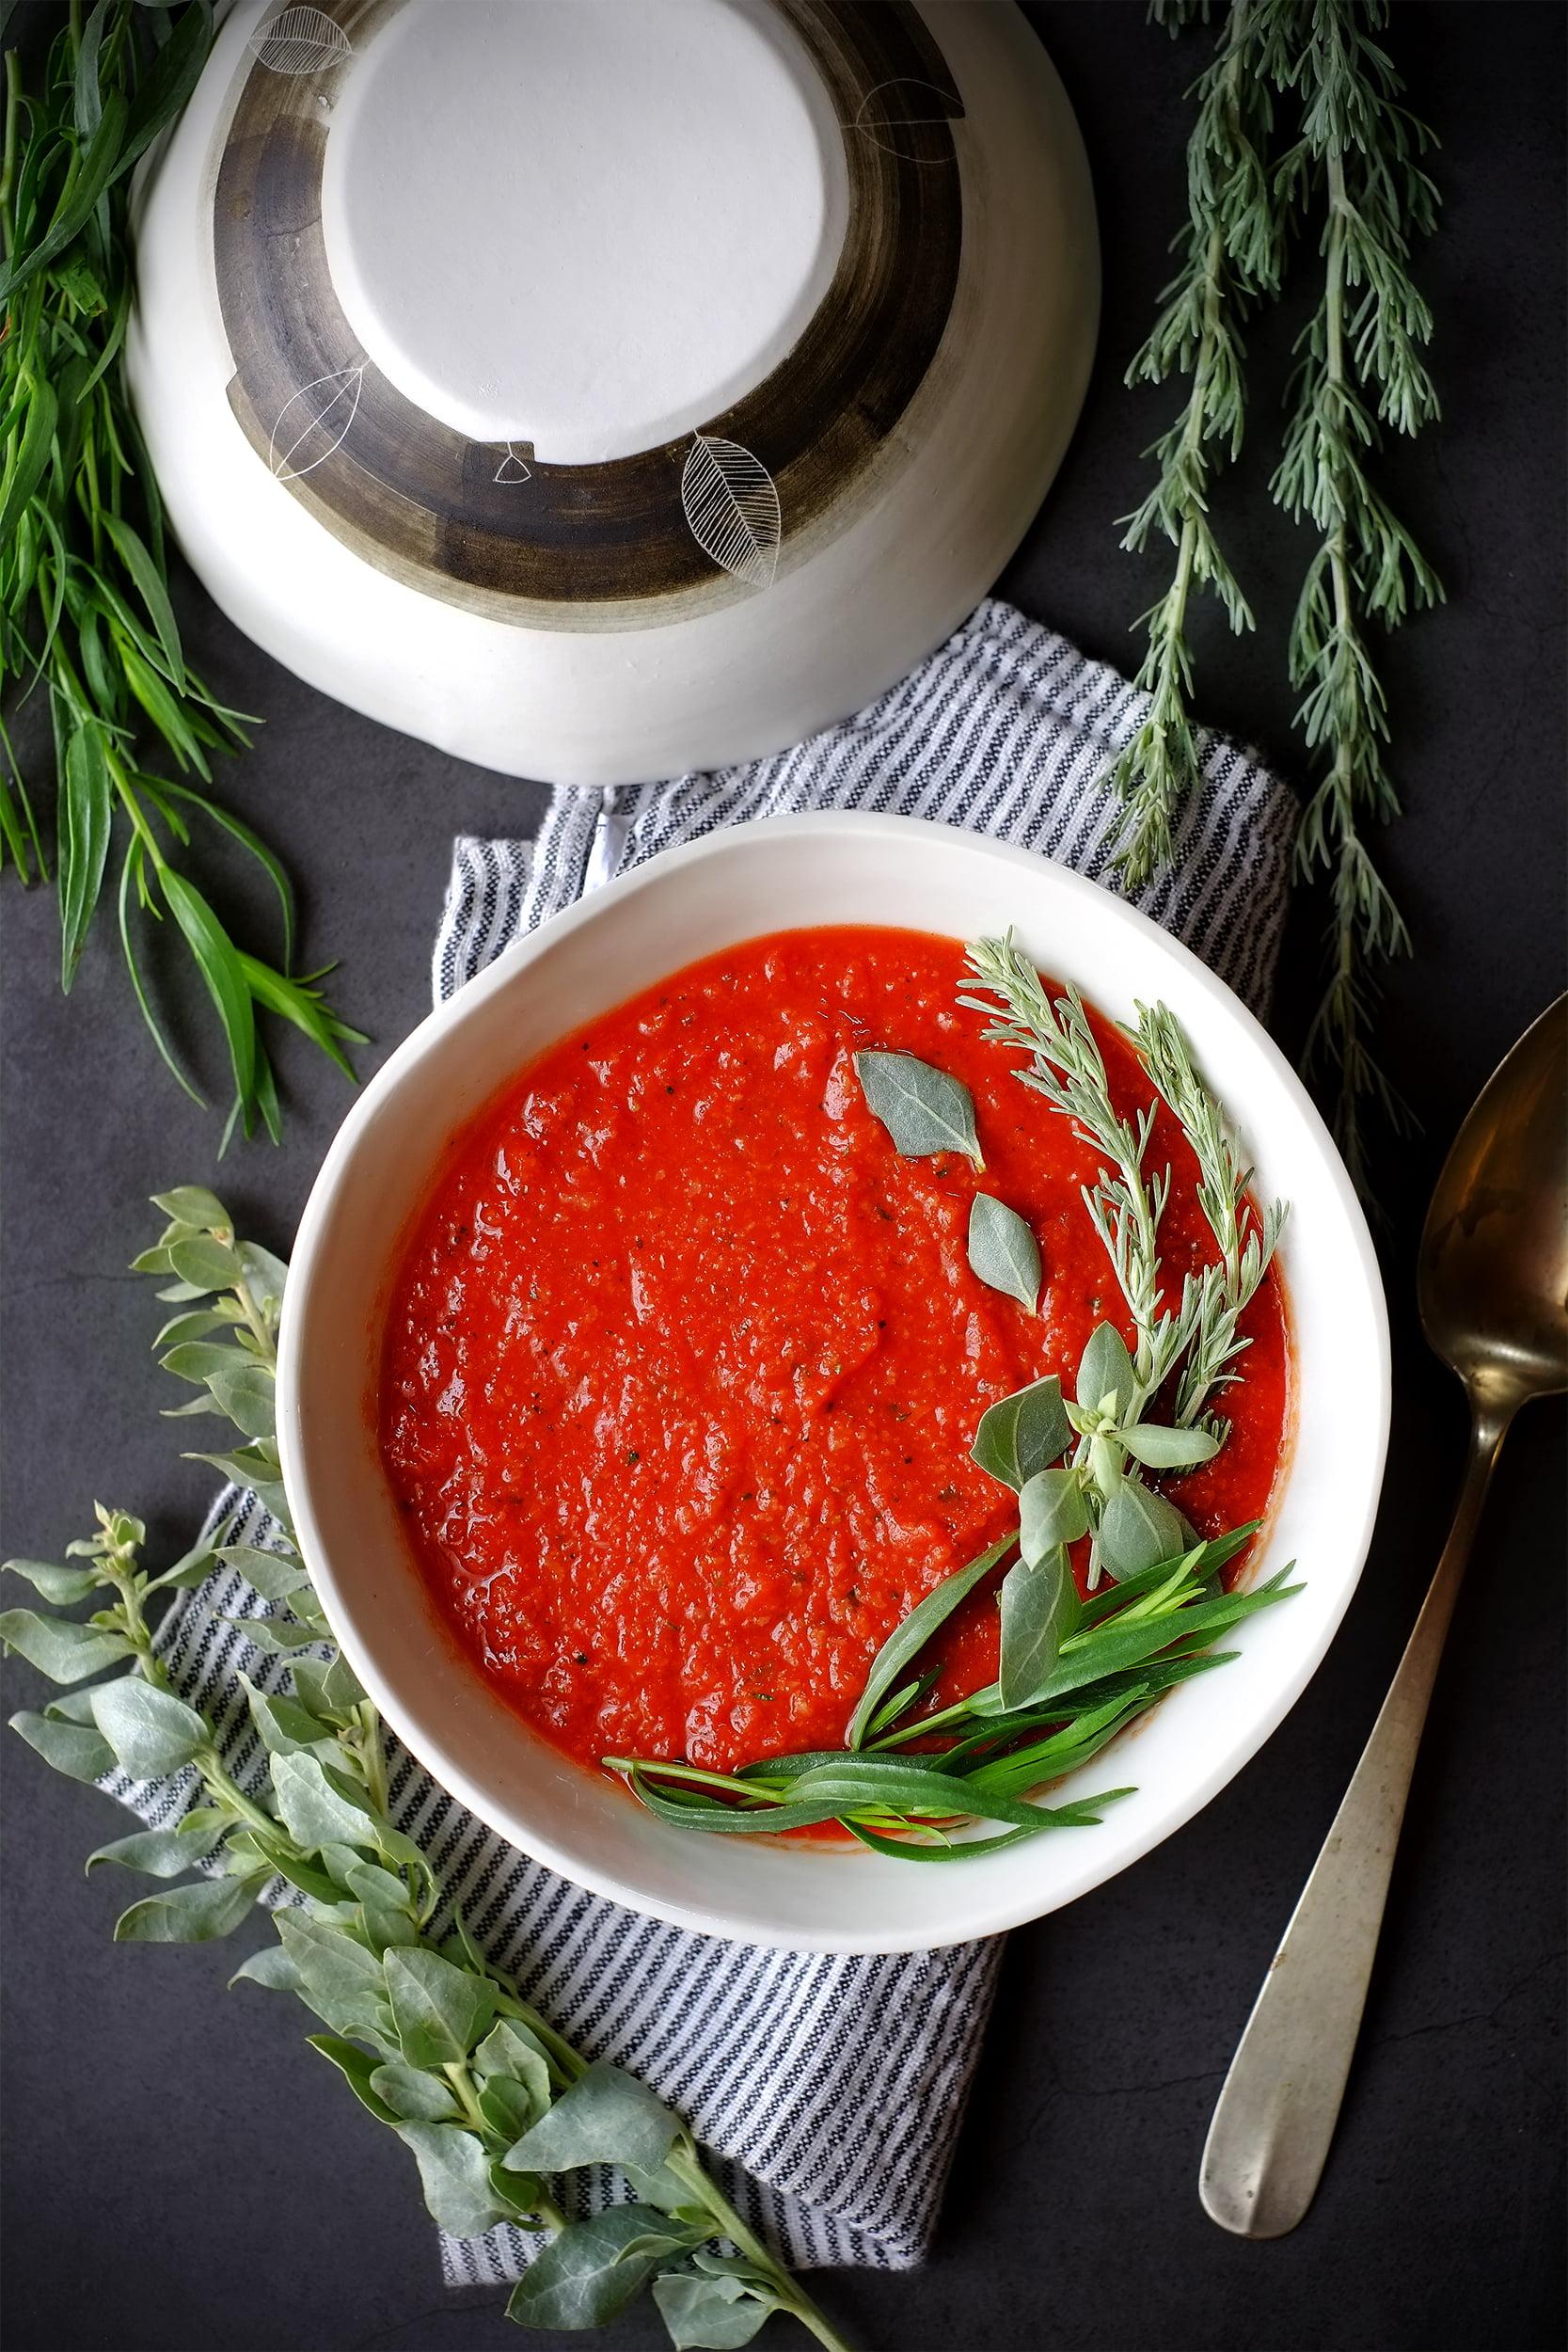 Gazpacho alle due artemisie, con erba sale 1